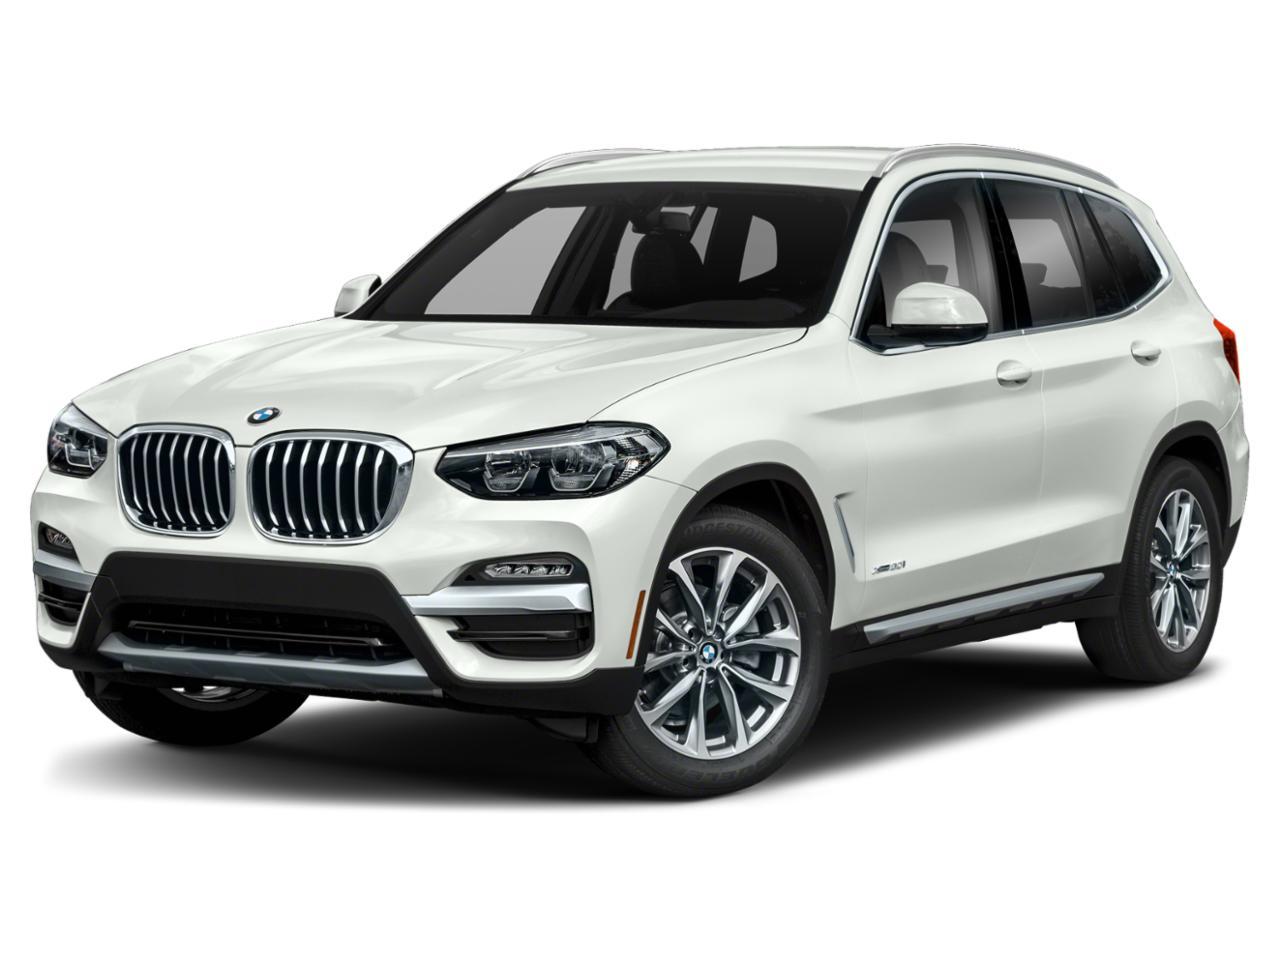 2018 BMW X3 xDrive30i Vehicle Photo in TEMPLE, TX 76504-3447